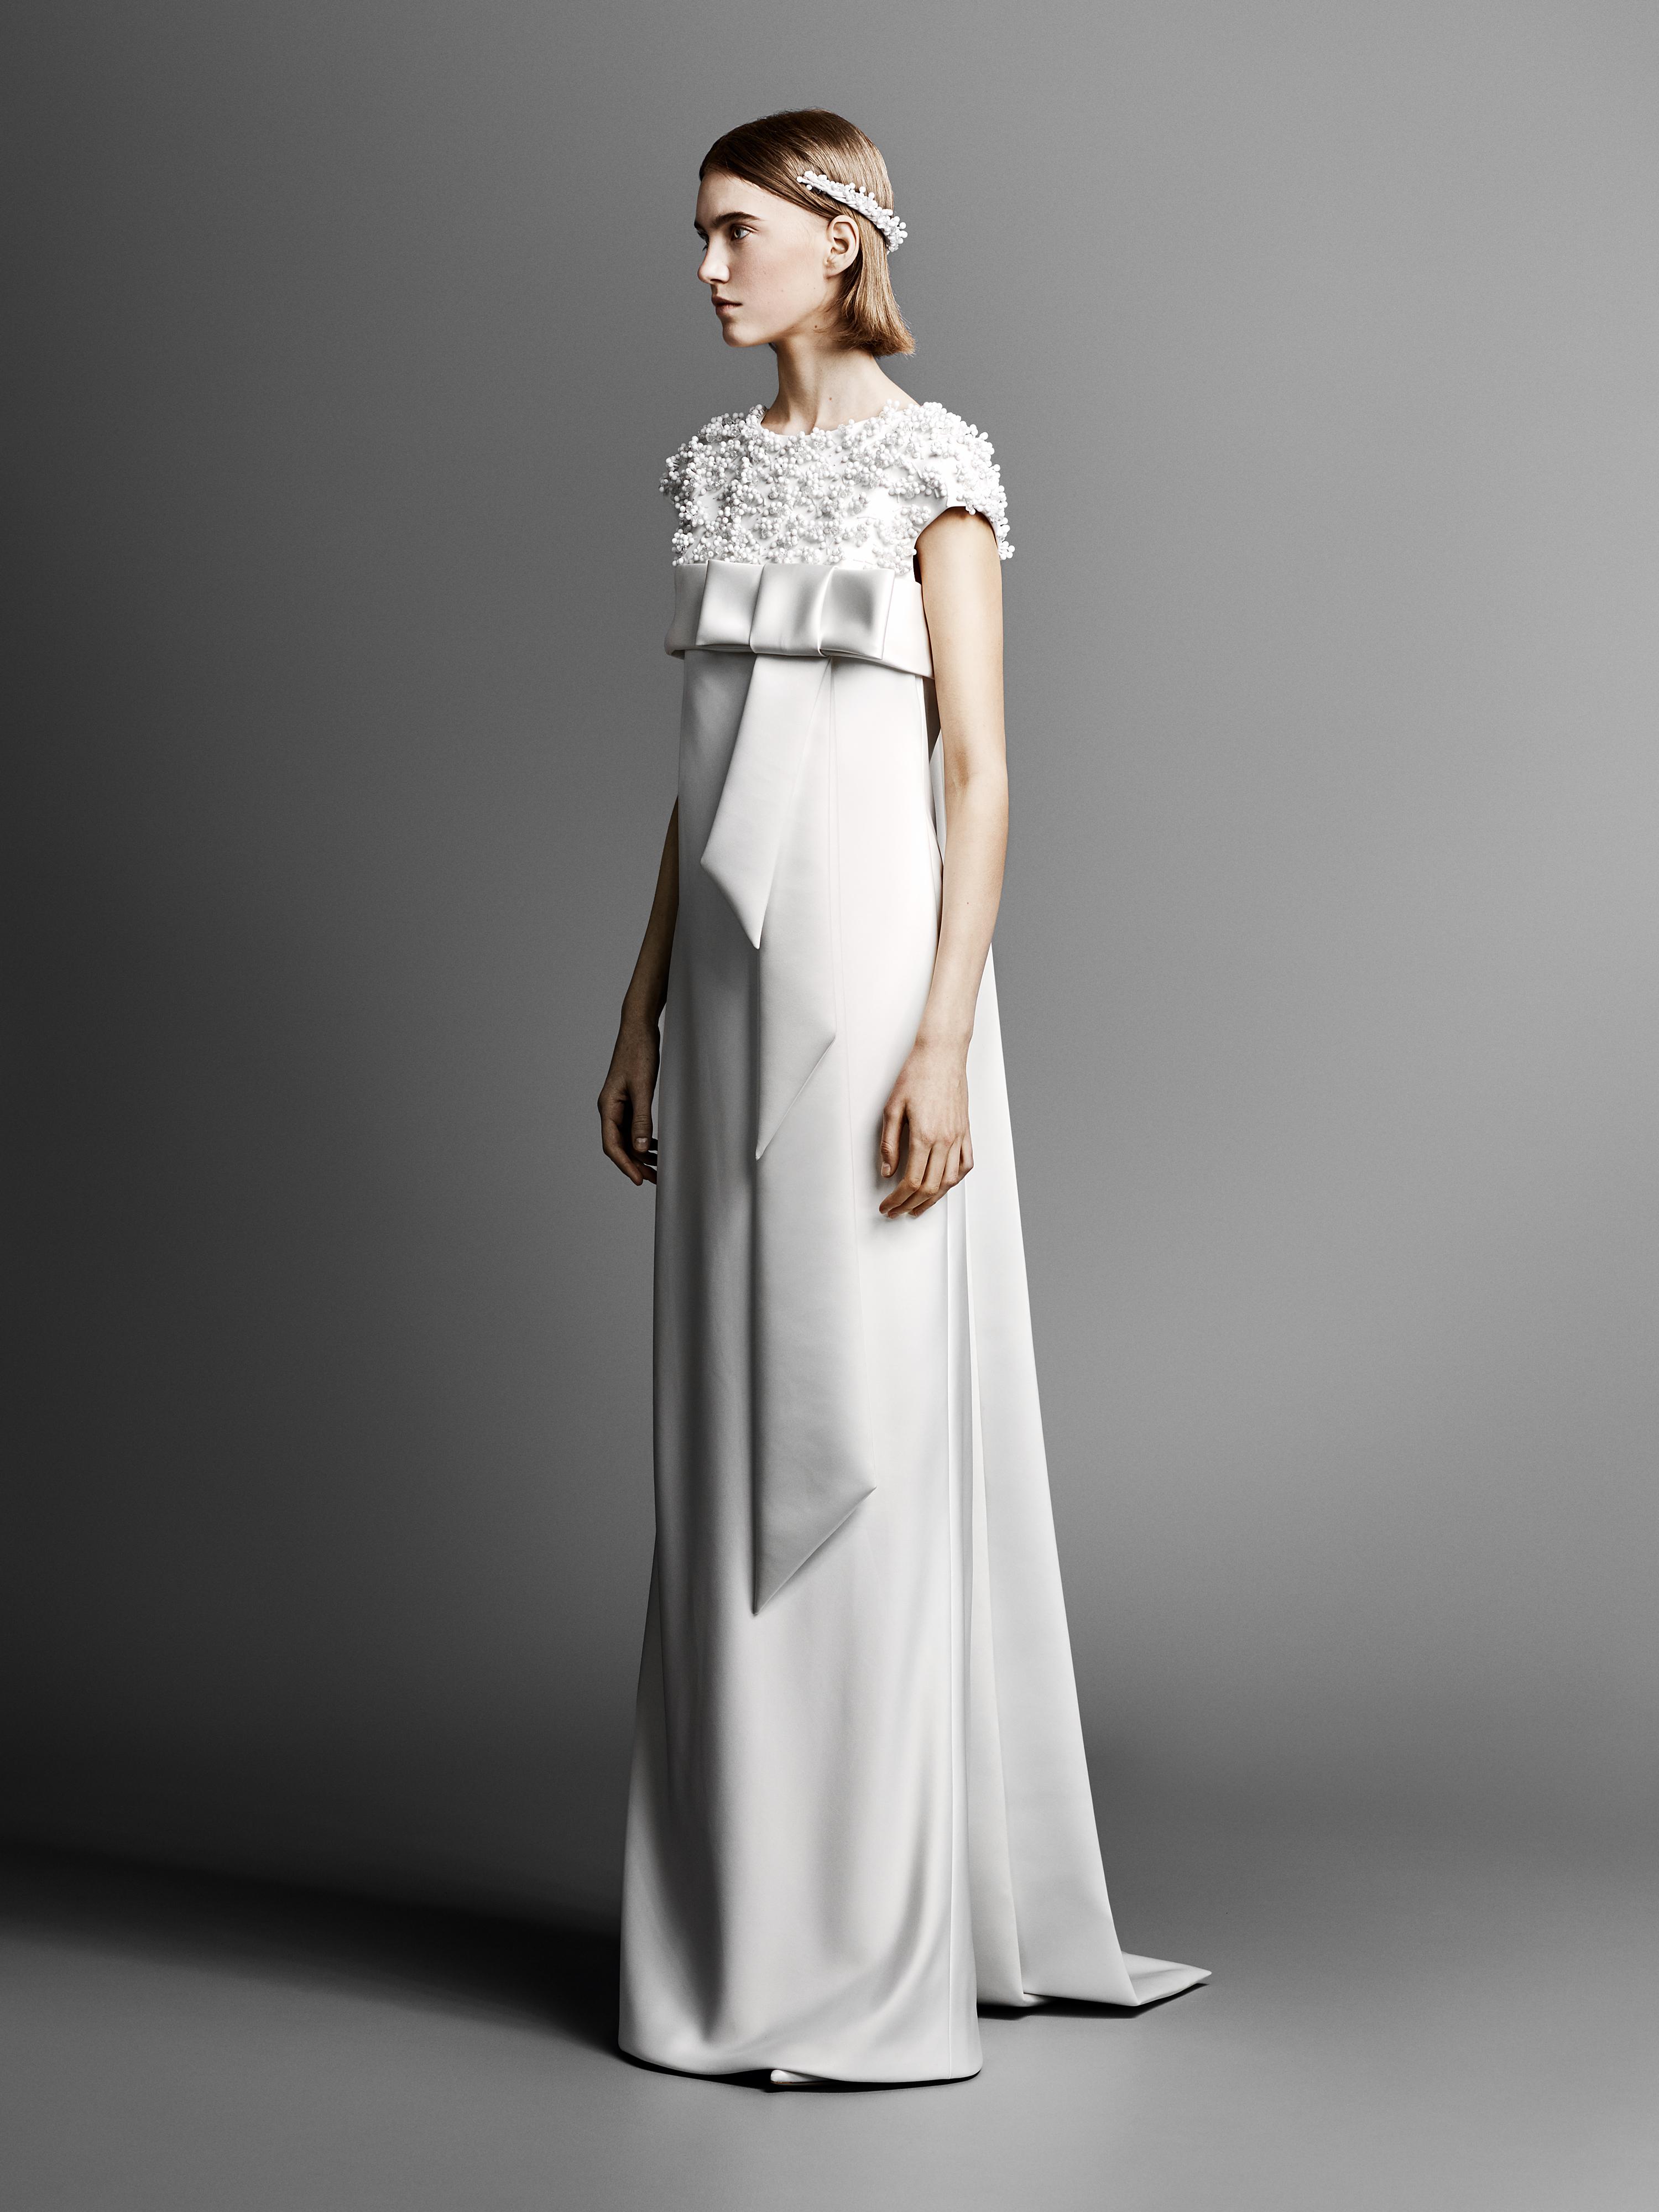 Viktor&Rolf Mariage Spring 2019 Wedding Dress Collection